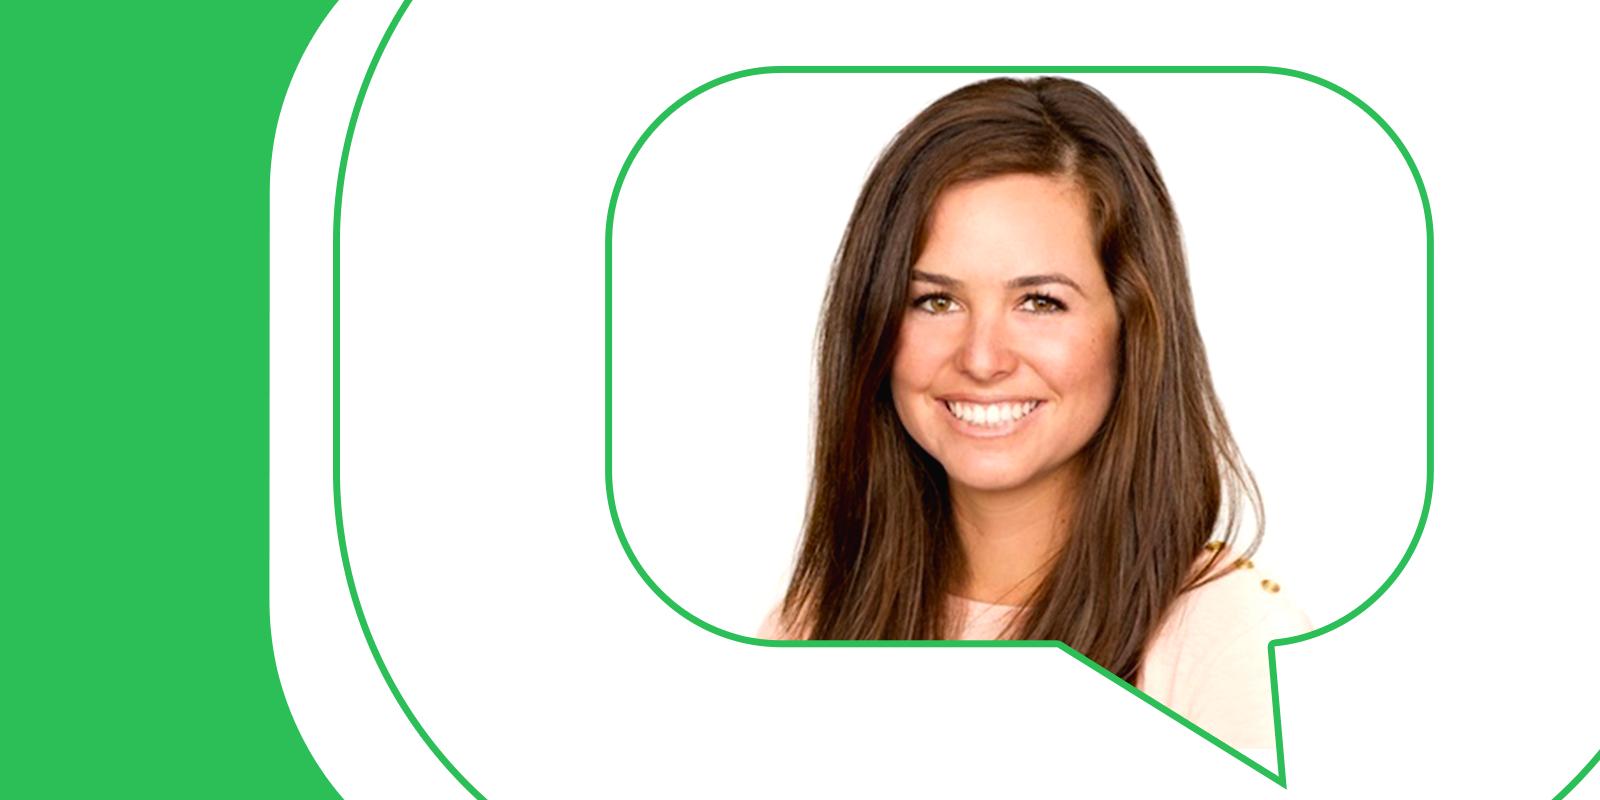 Employee Spotlight: Jenna Fabino, Customer Experience Project Manager